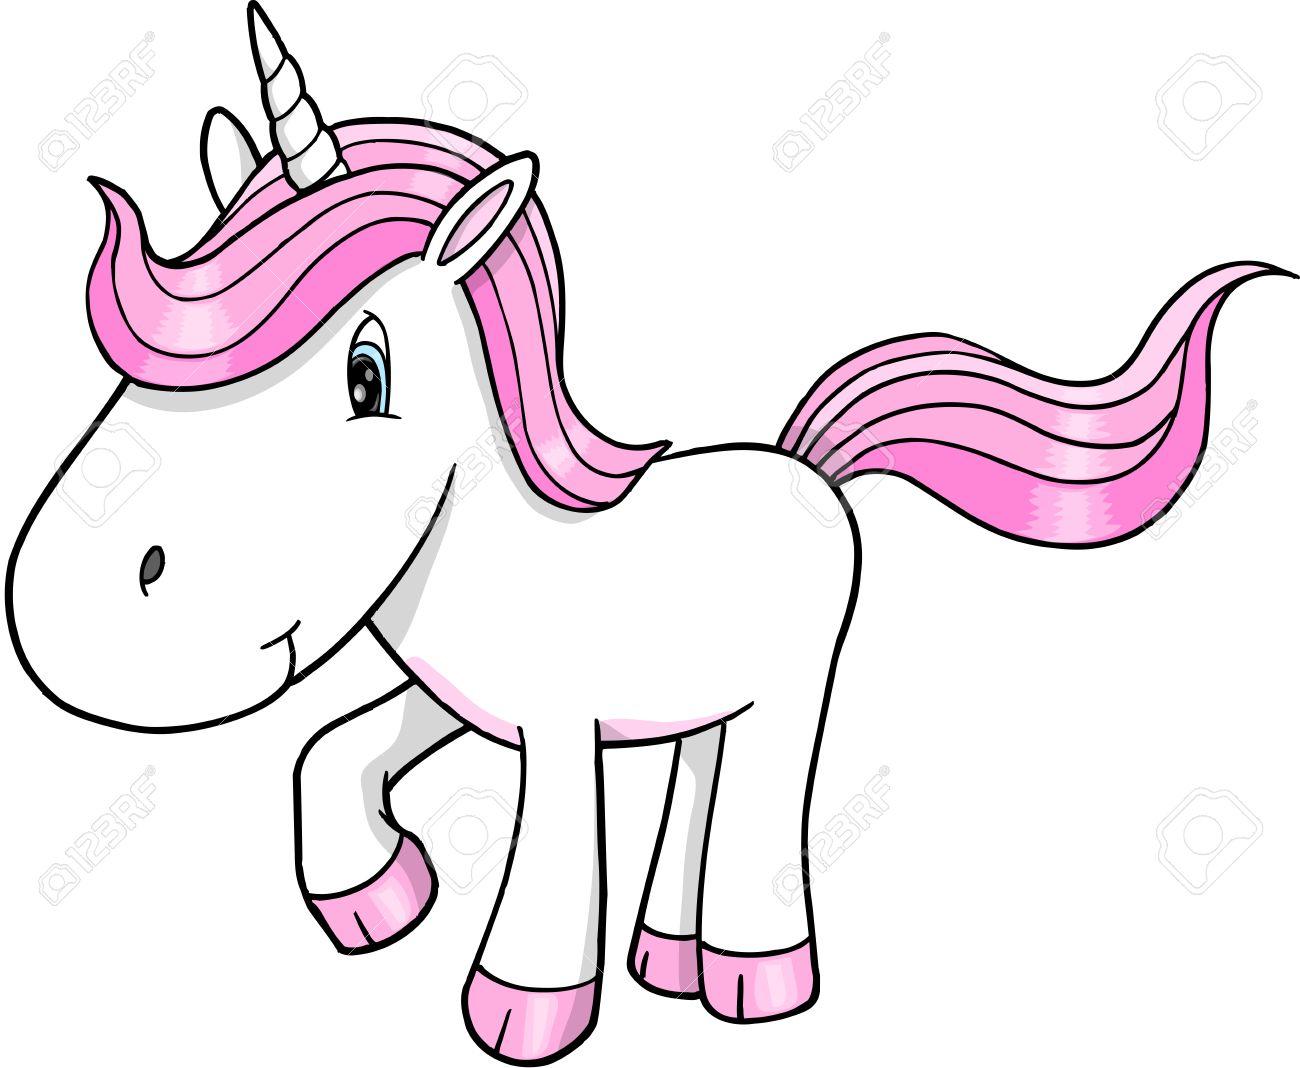 cute unicorn vector illustration art royalty free cliparts vectors rh 123rf com free unicorn vector images free vector unicorn face